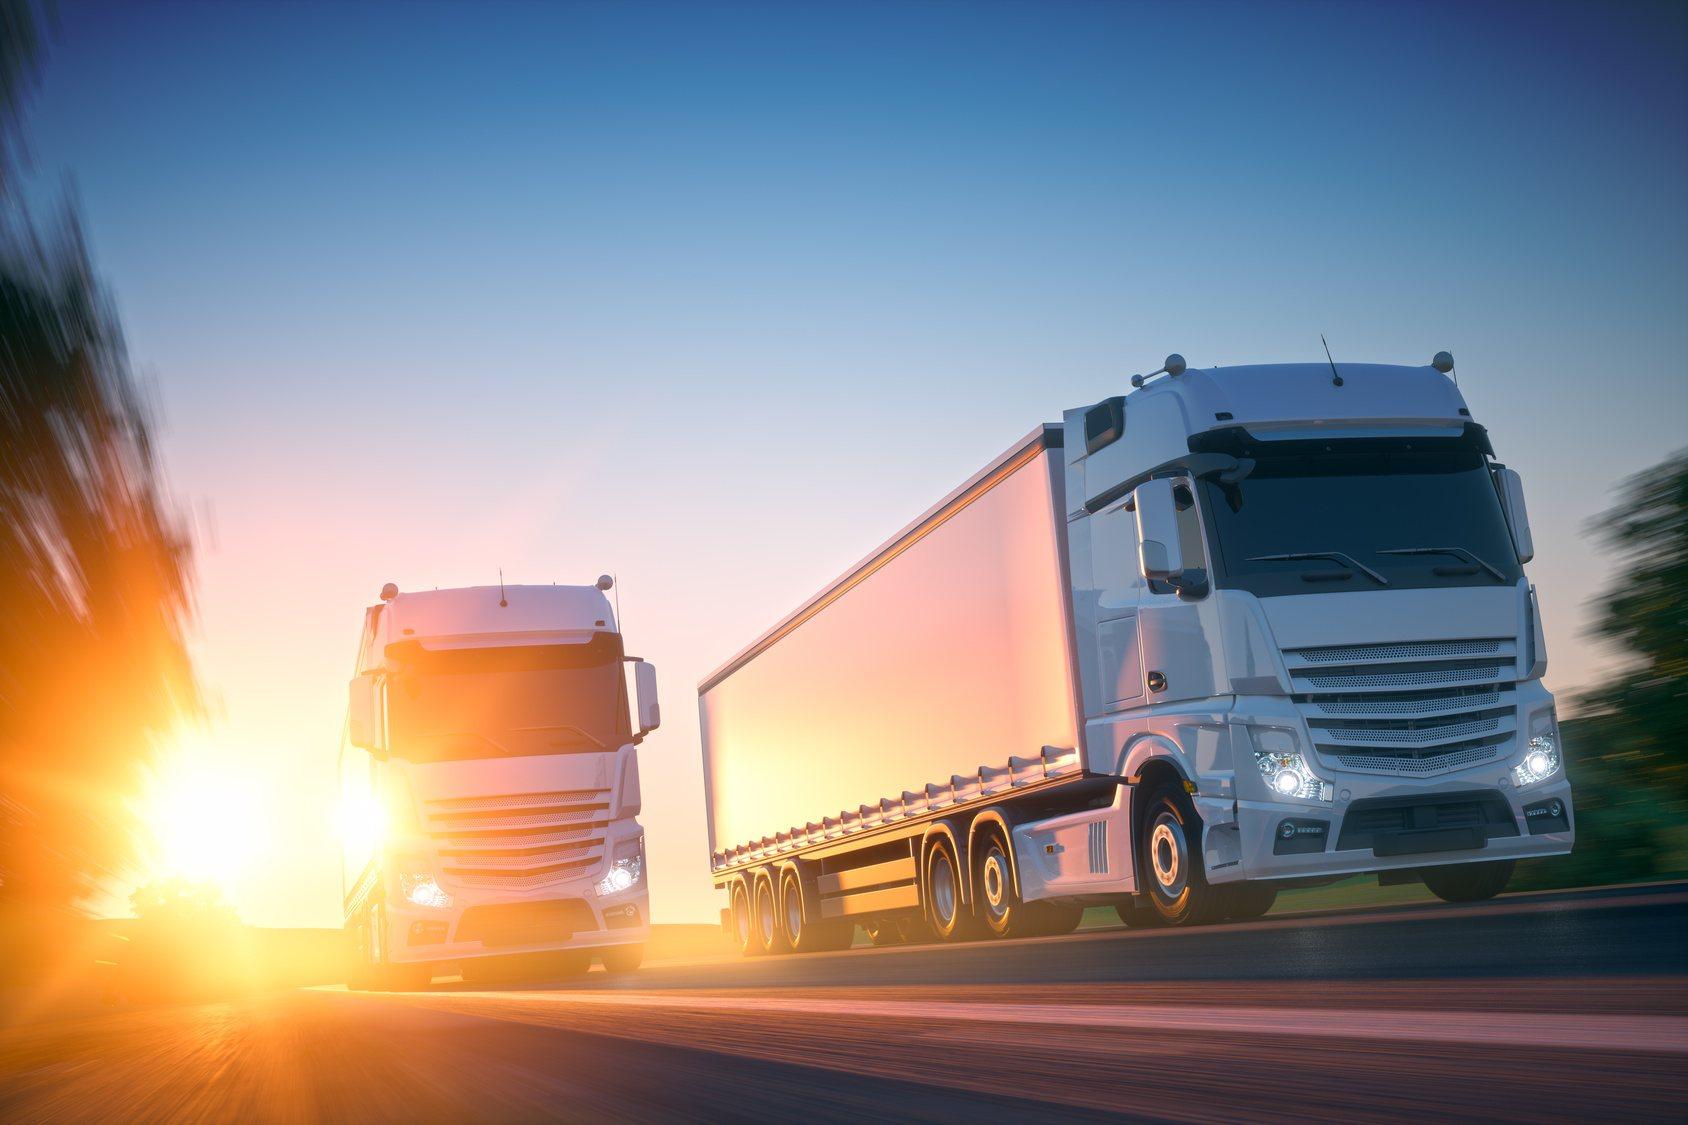 KAPSARC Transport Analysis Framework for Freight